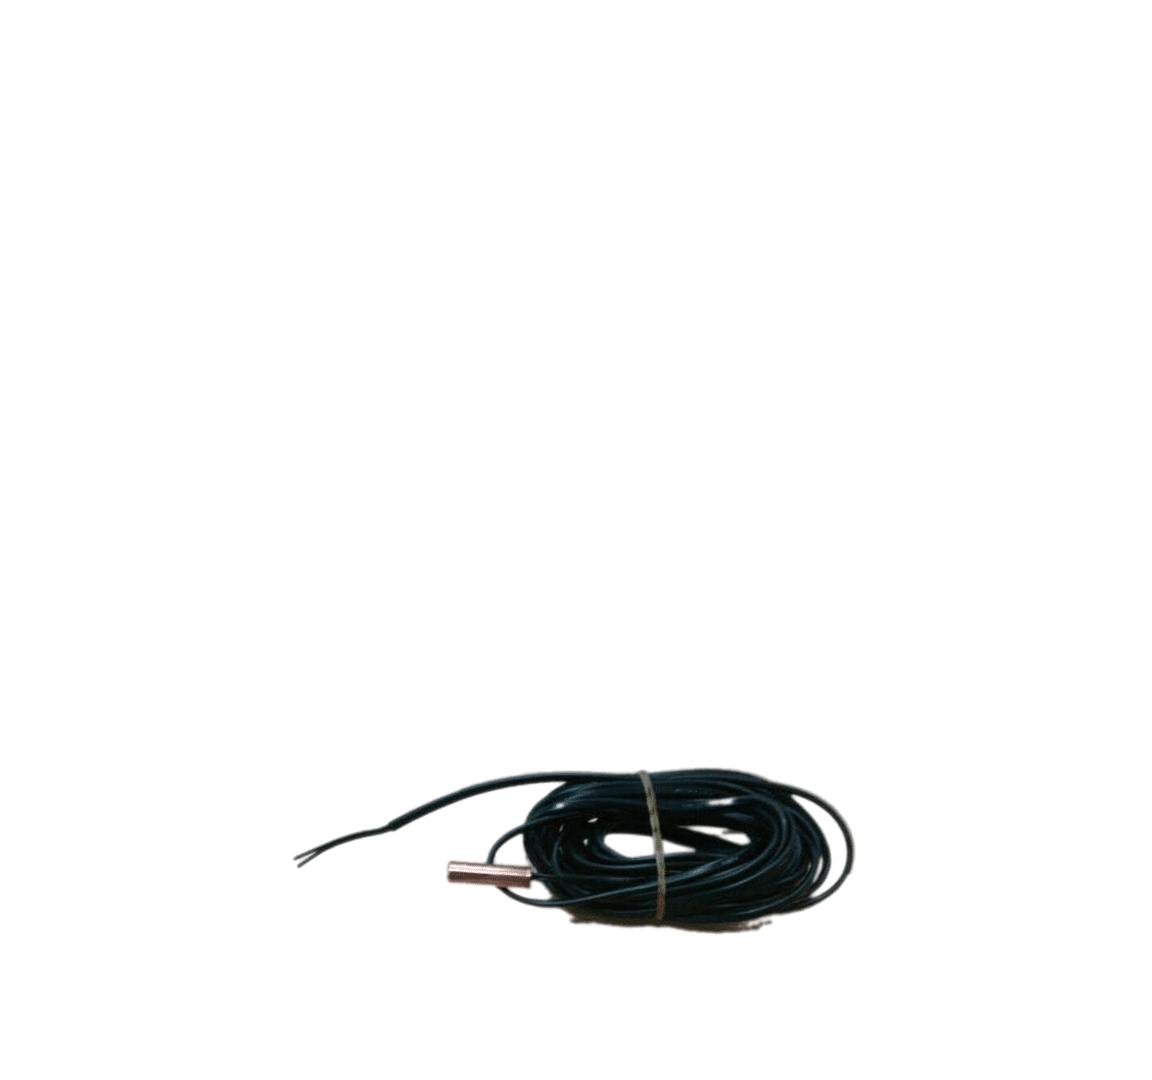 Tank sensor met 20m kabellengte van DHPS